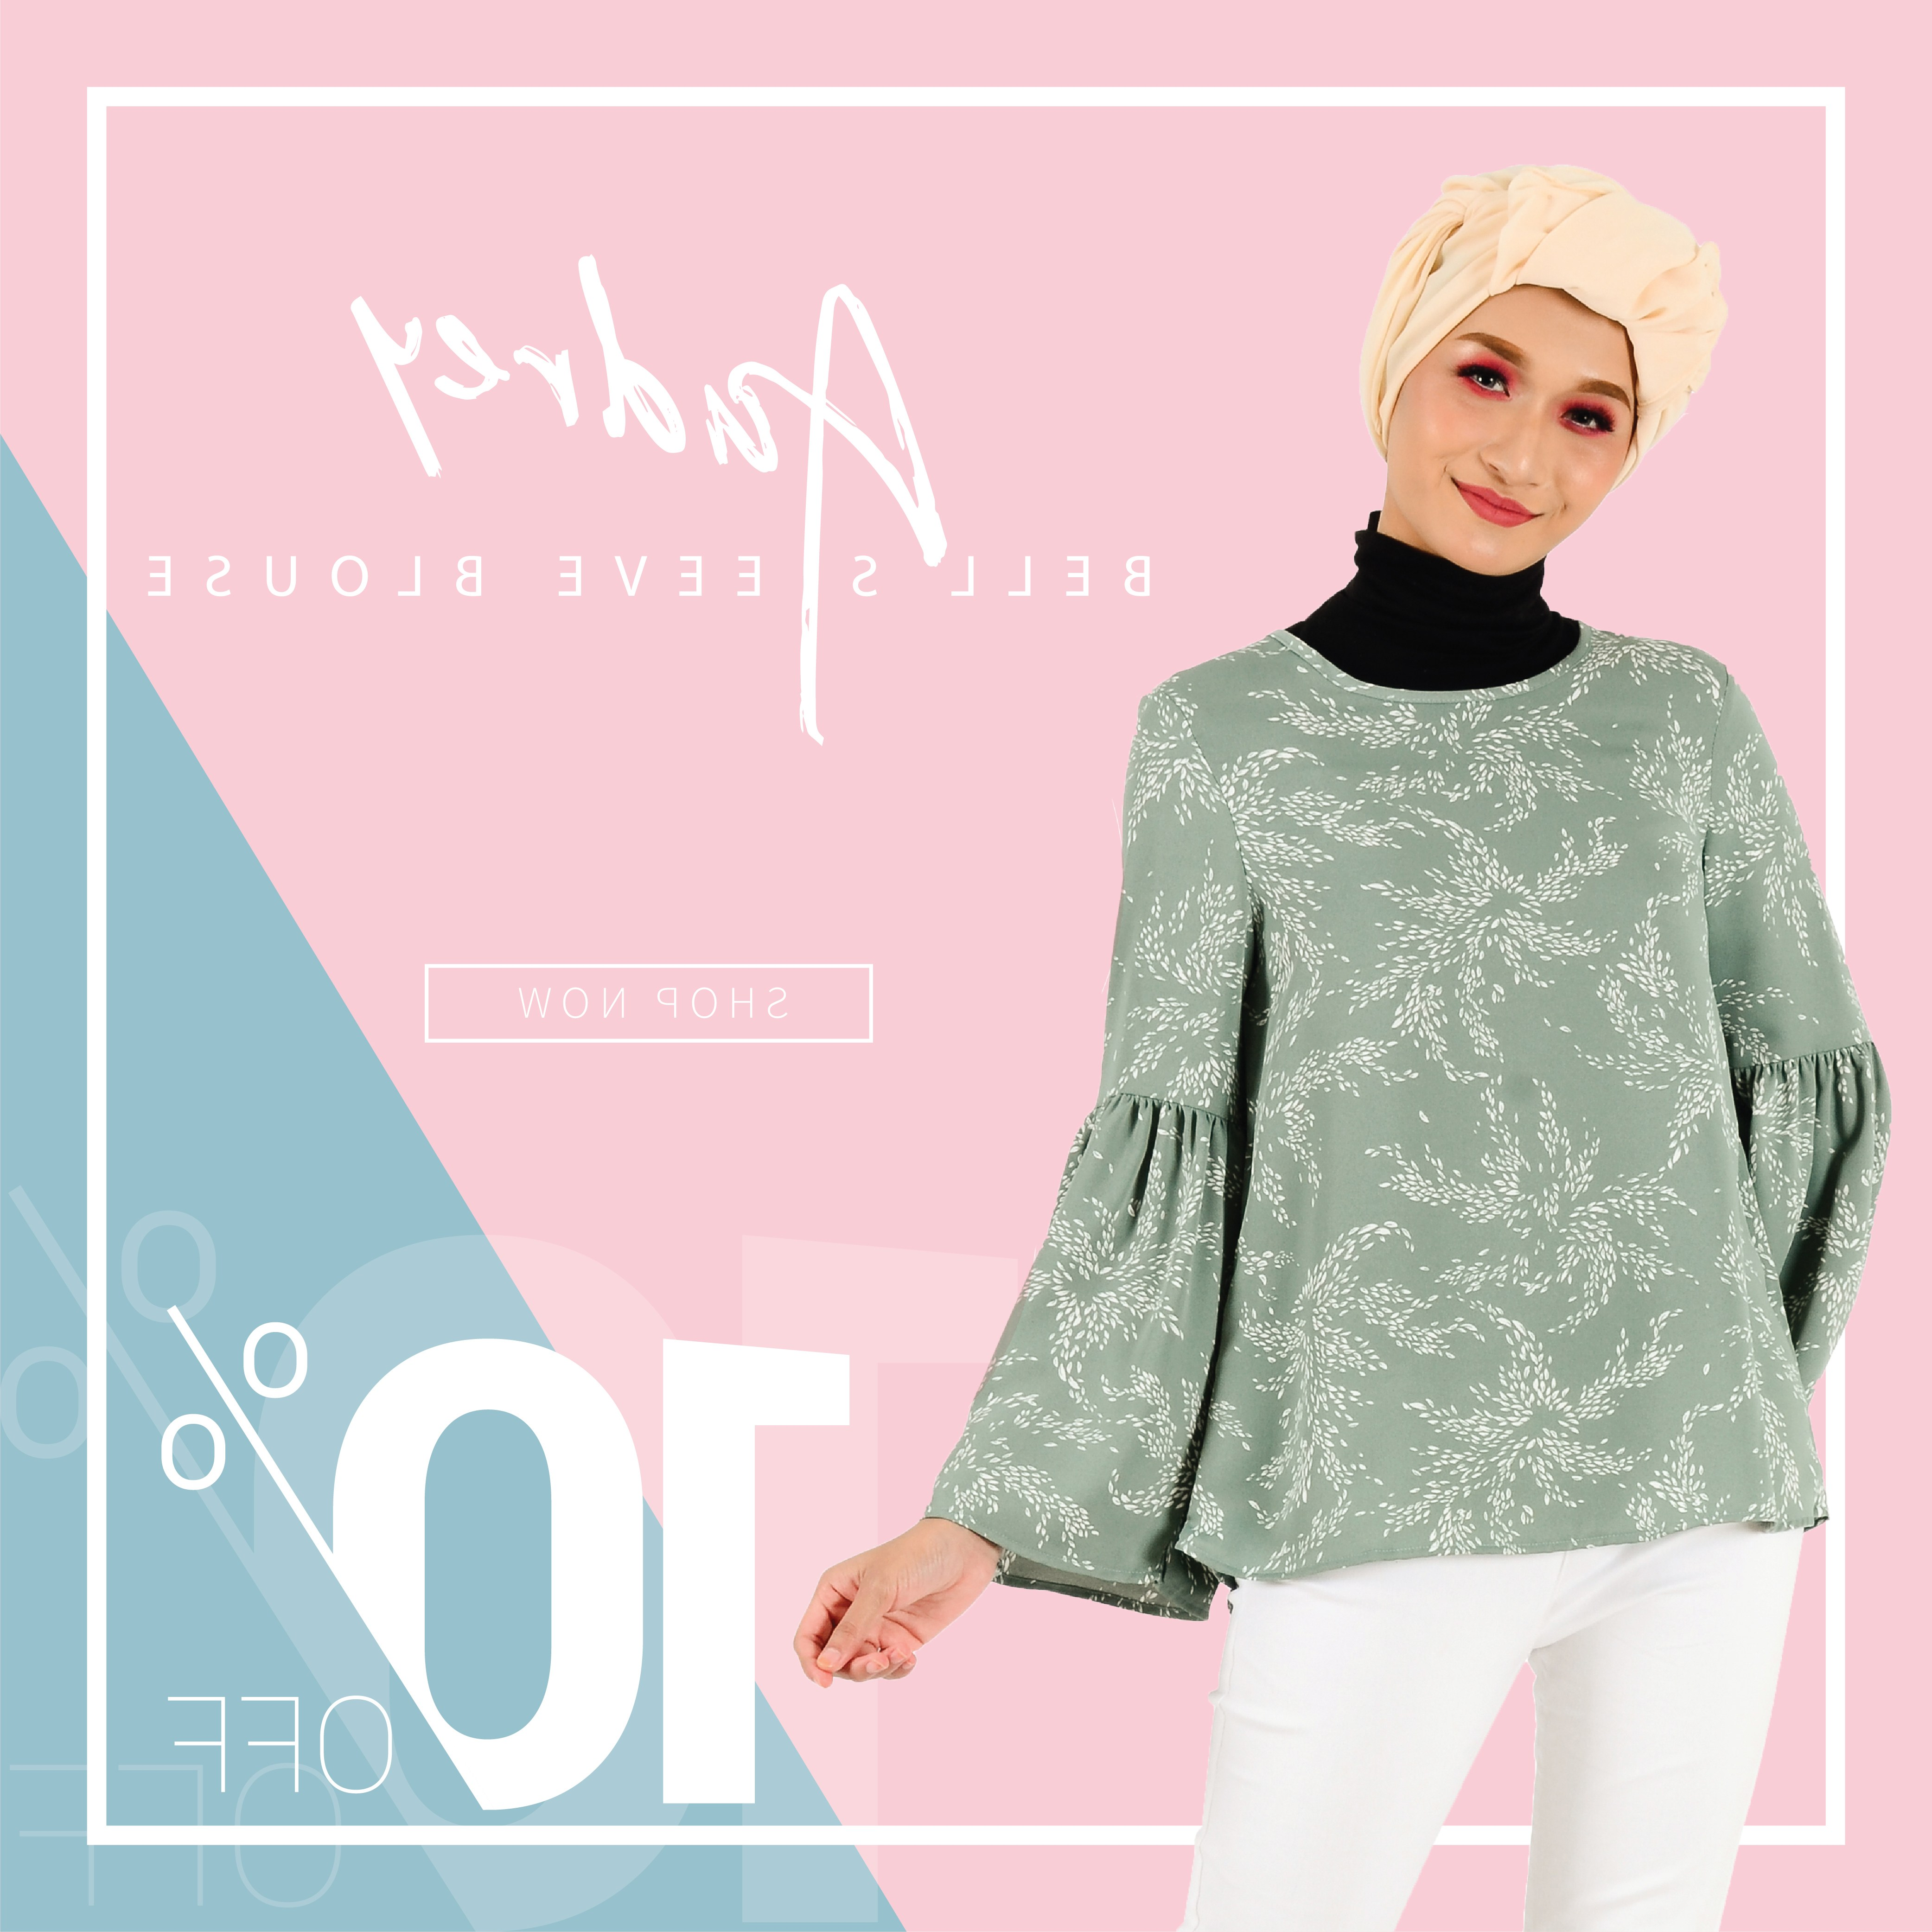 Design Baju Pengantin Muslimah Elegan 9ddf Mytrend S Muslimah Fashion Blog